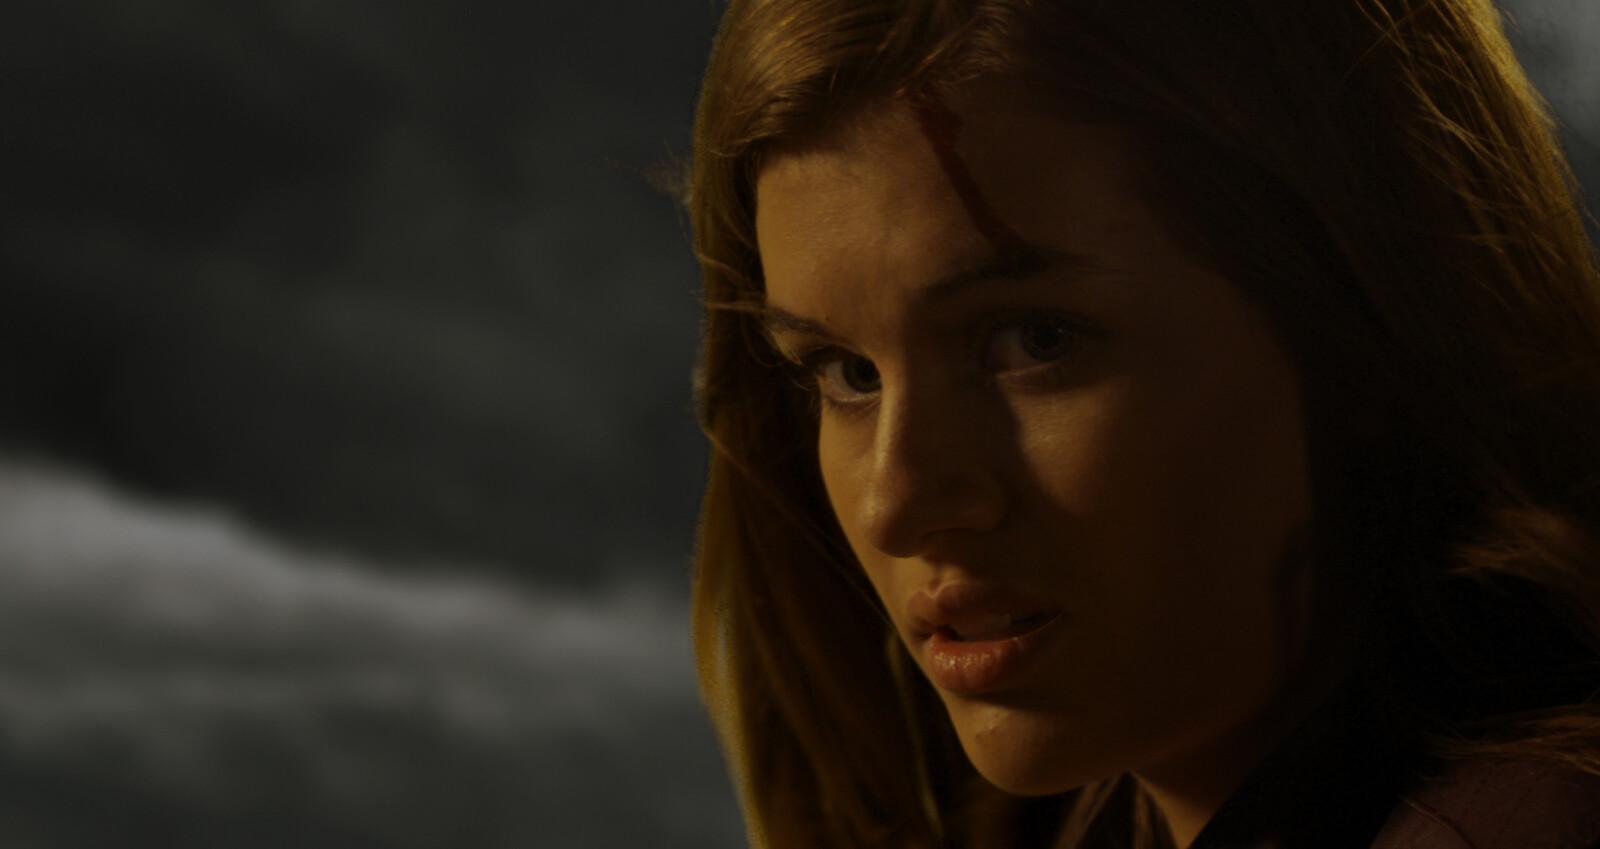 Eye of Minds trailer